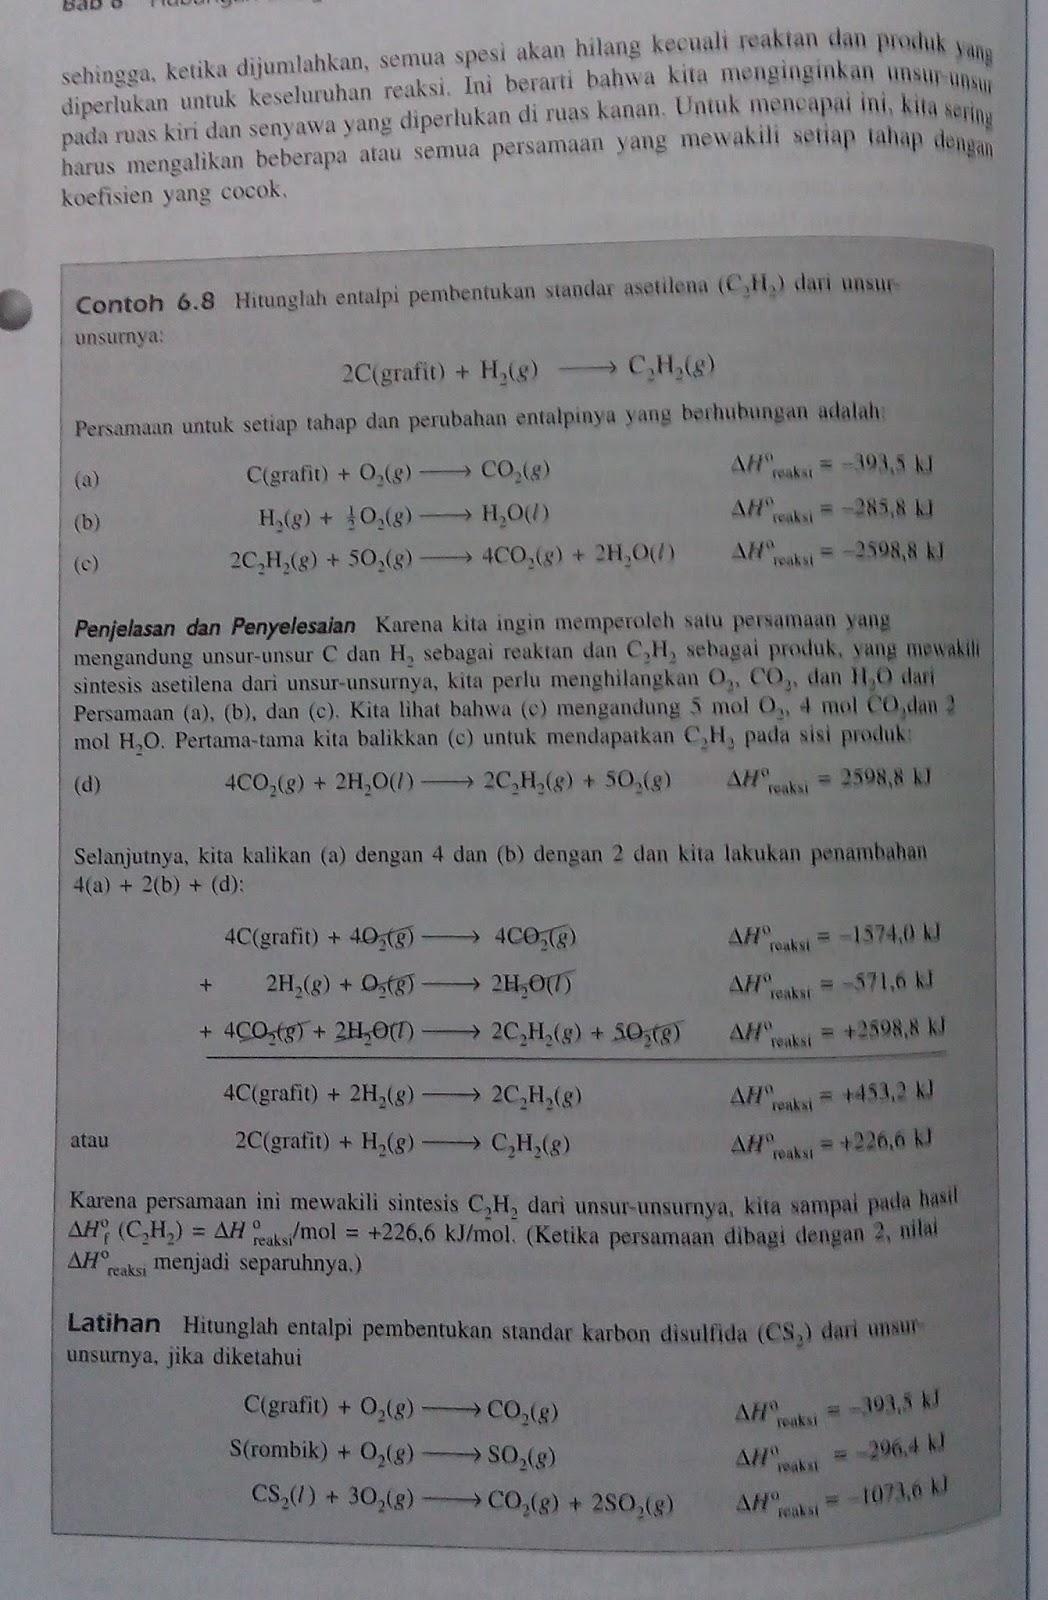 Kelas 11 ipa latihan soal hukum hess kimia industri catat dan simak contoh soal hukum hess berikut lalu kerjakan latihannya di buku jurnalnya ccuart Choice Image